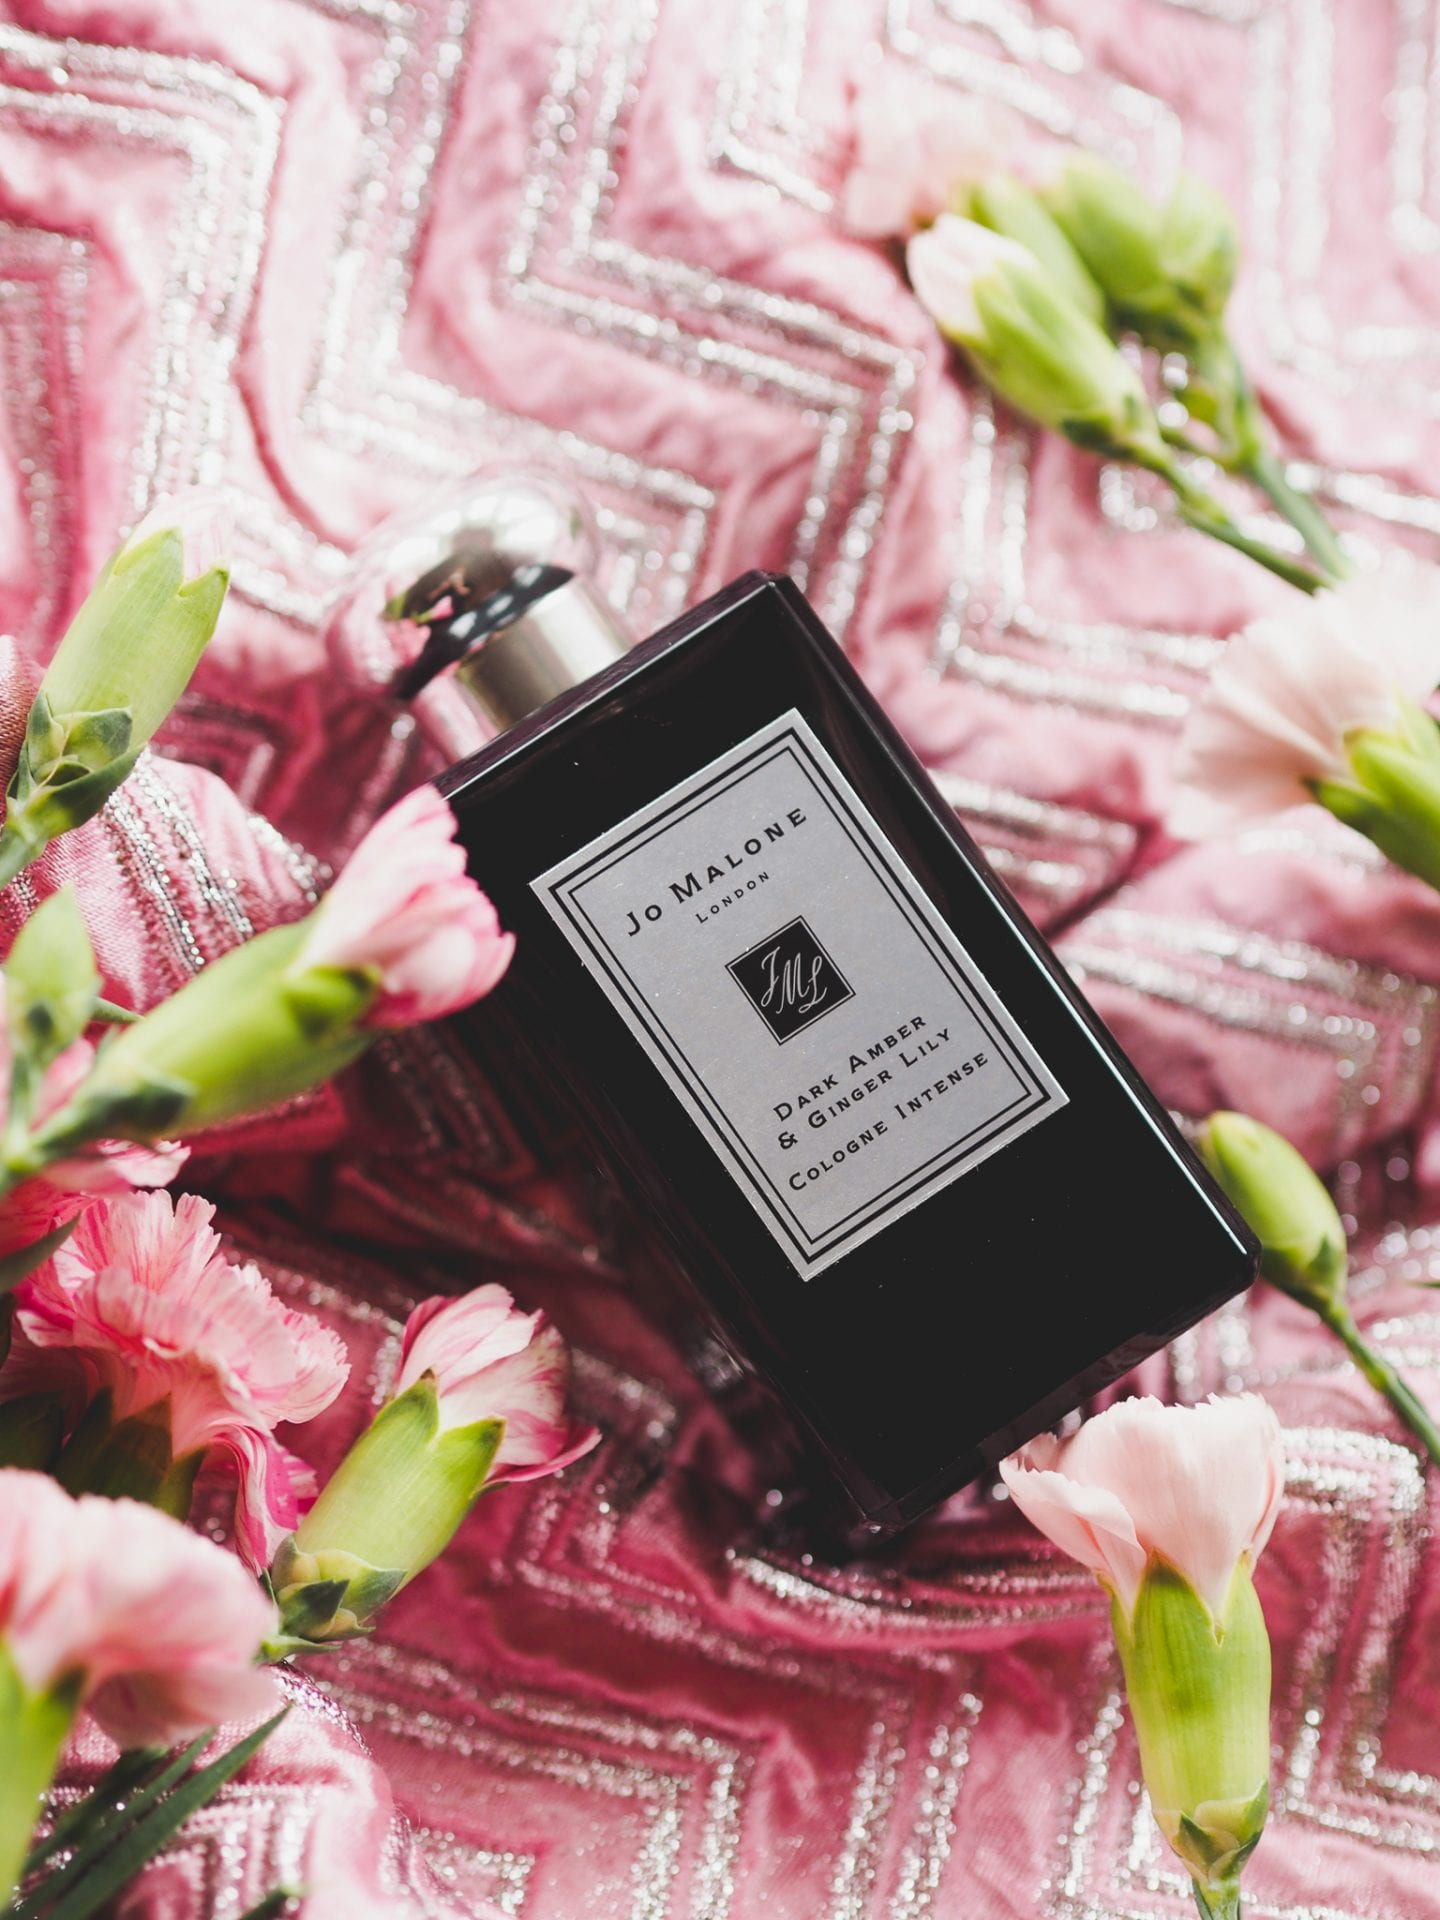 jo-malone-perfume-cologne-dark-amber-review